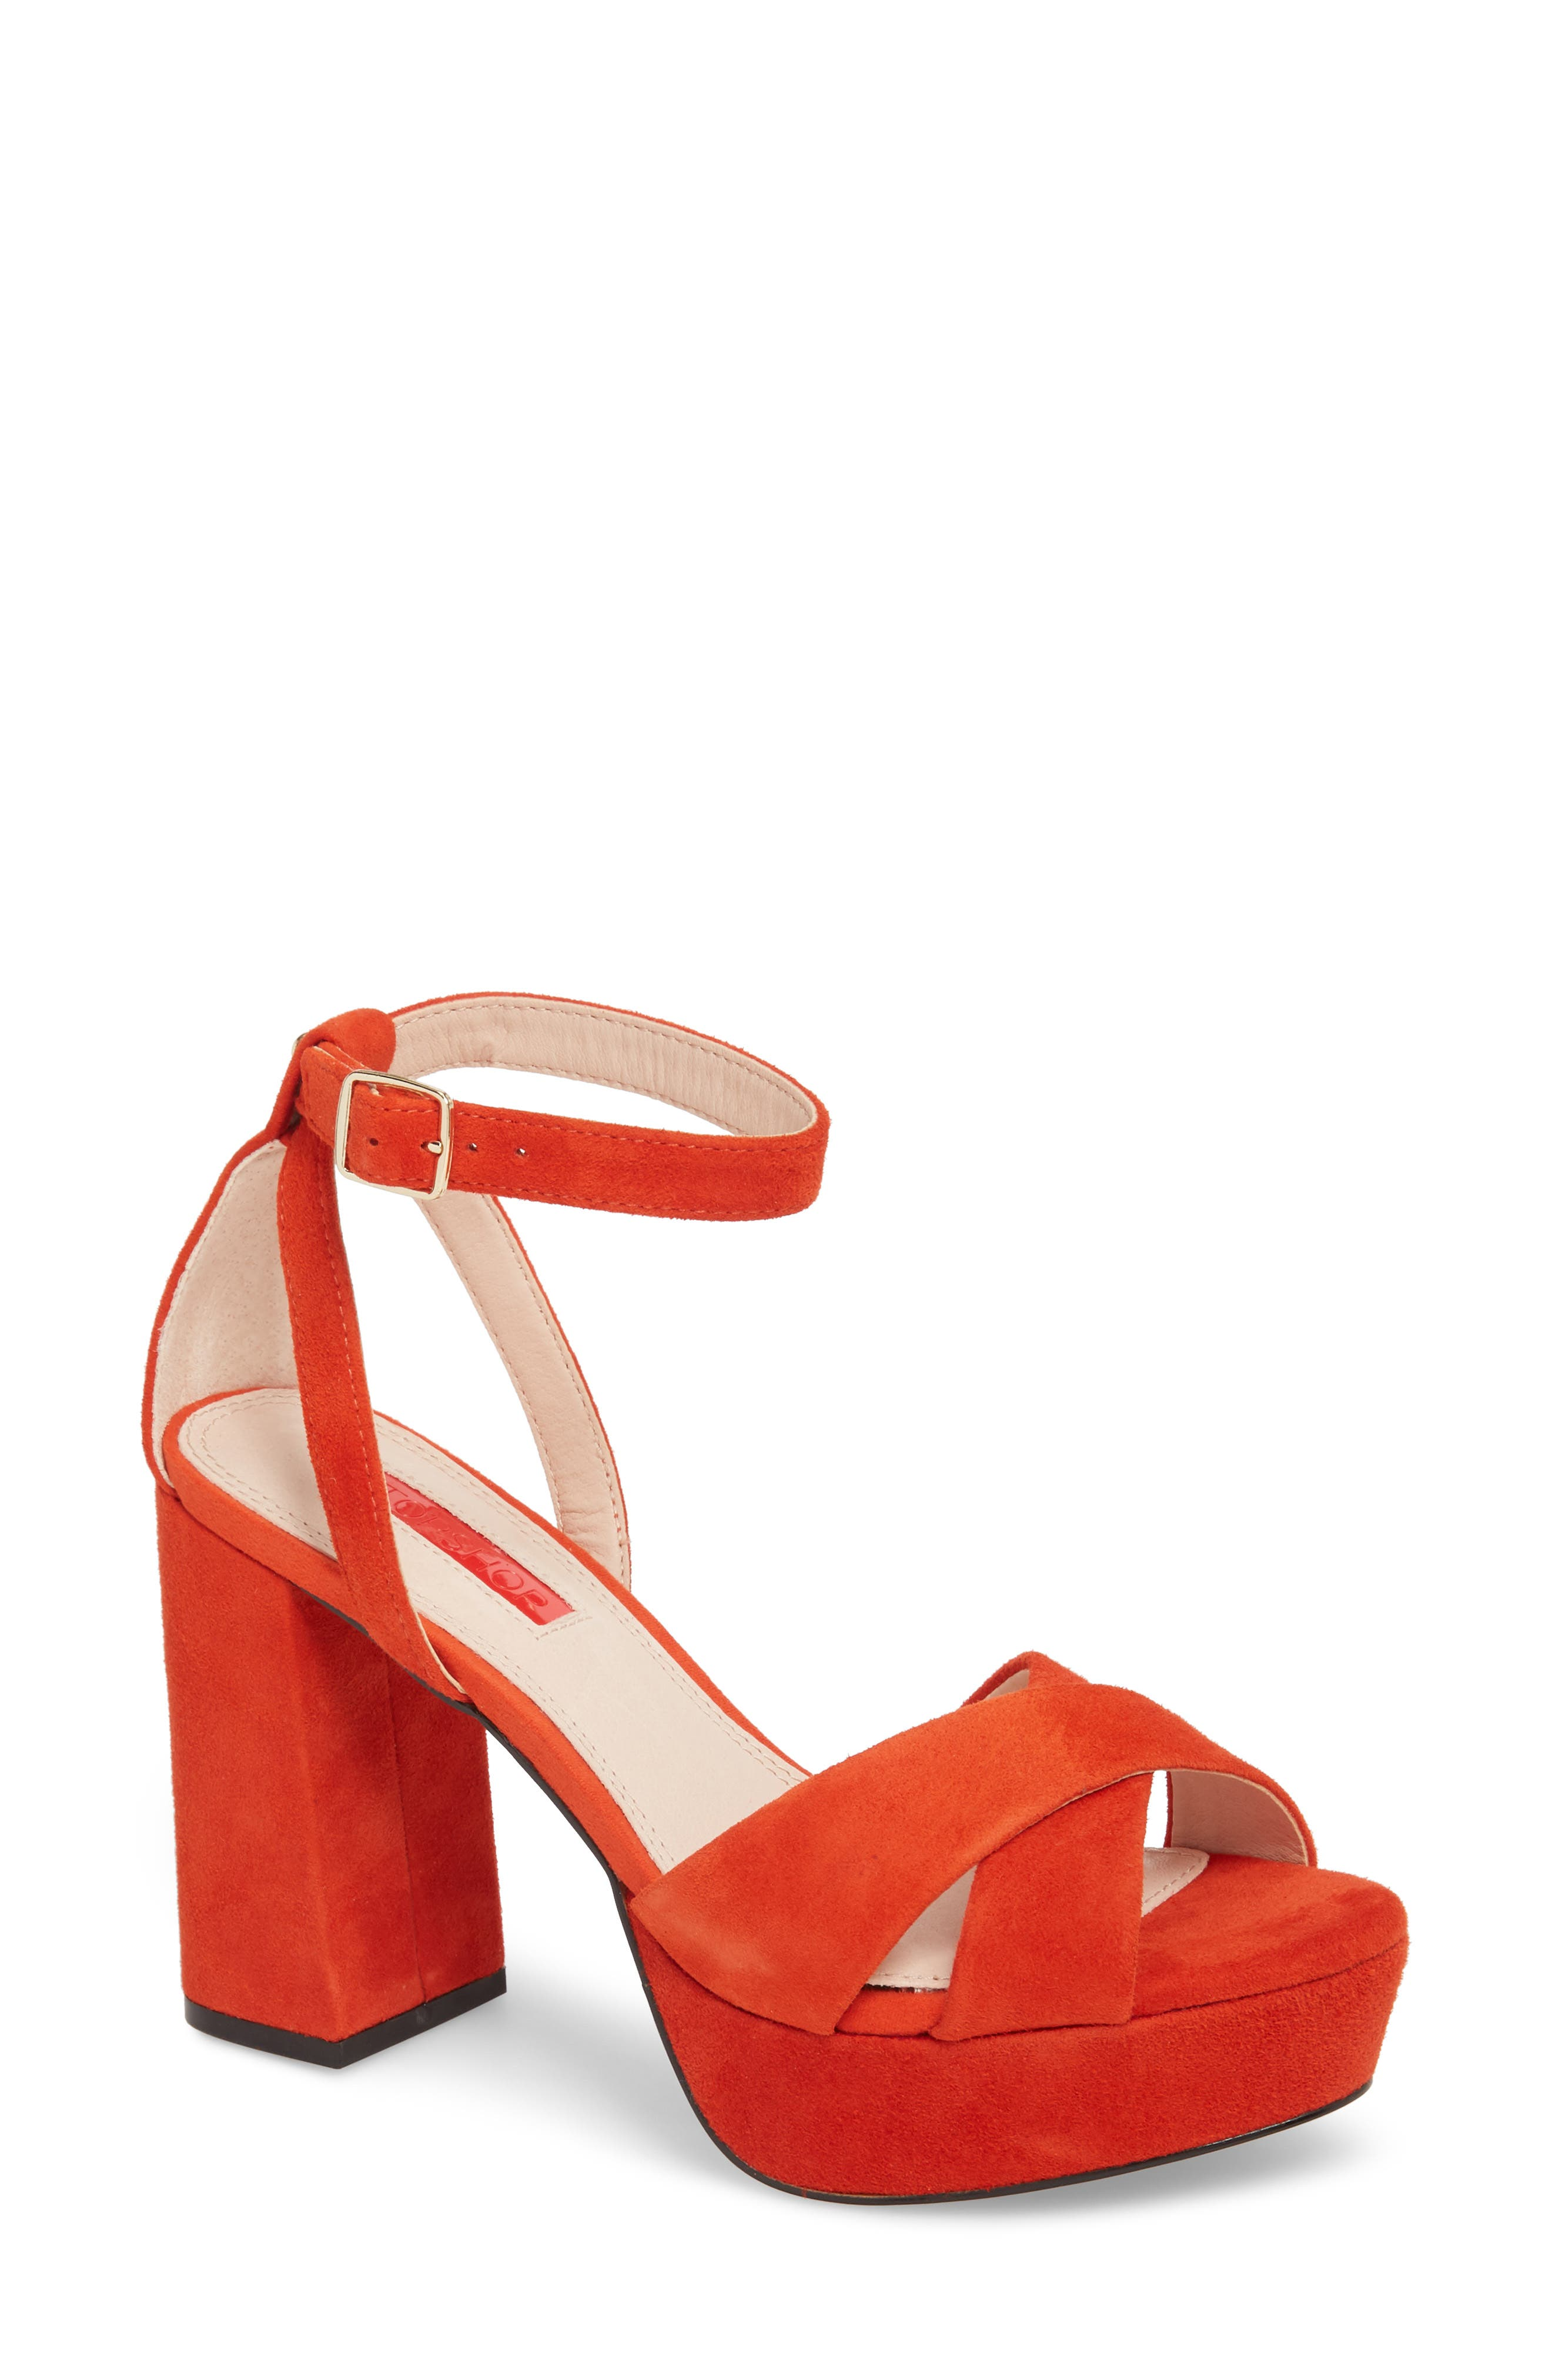 Leah Cross Strap Platform Sandal,                             Main thumbnail 1, color,                             Orange